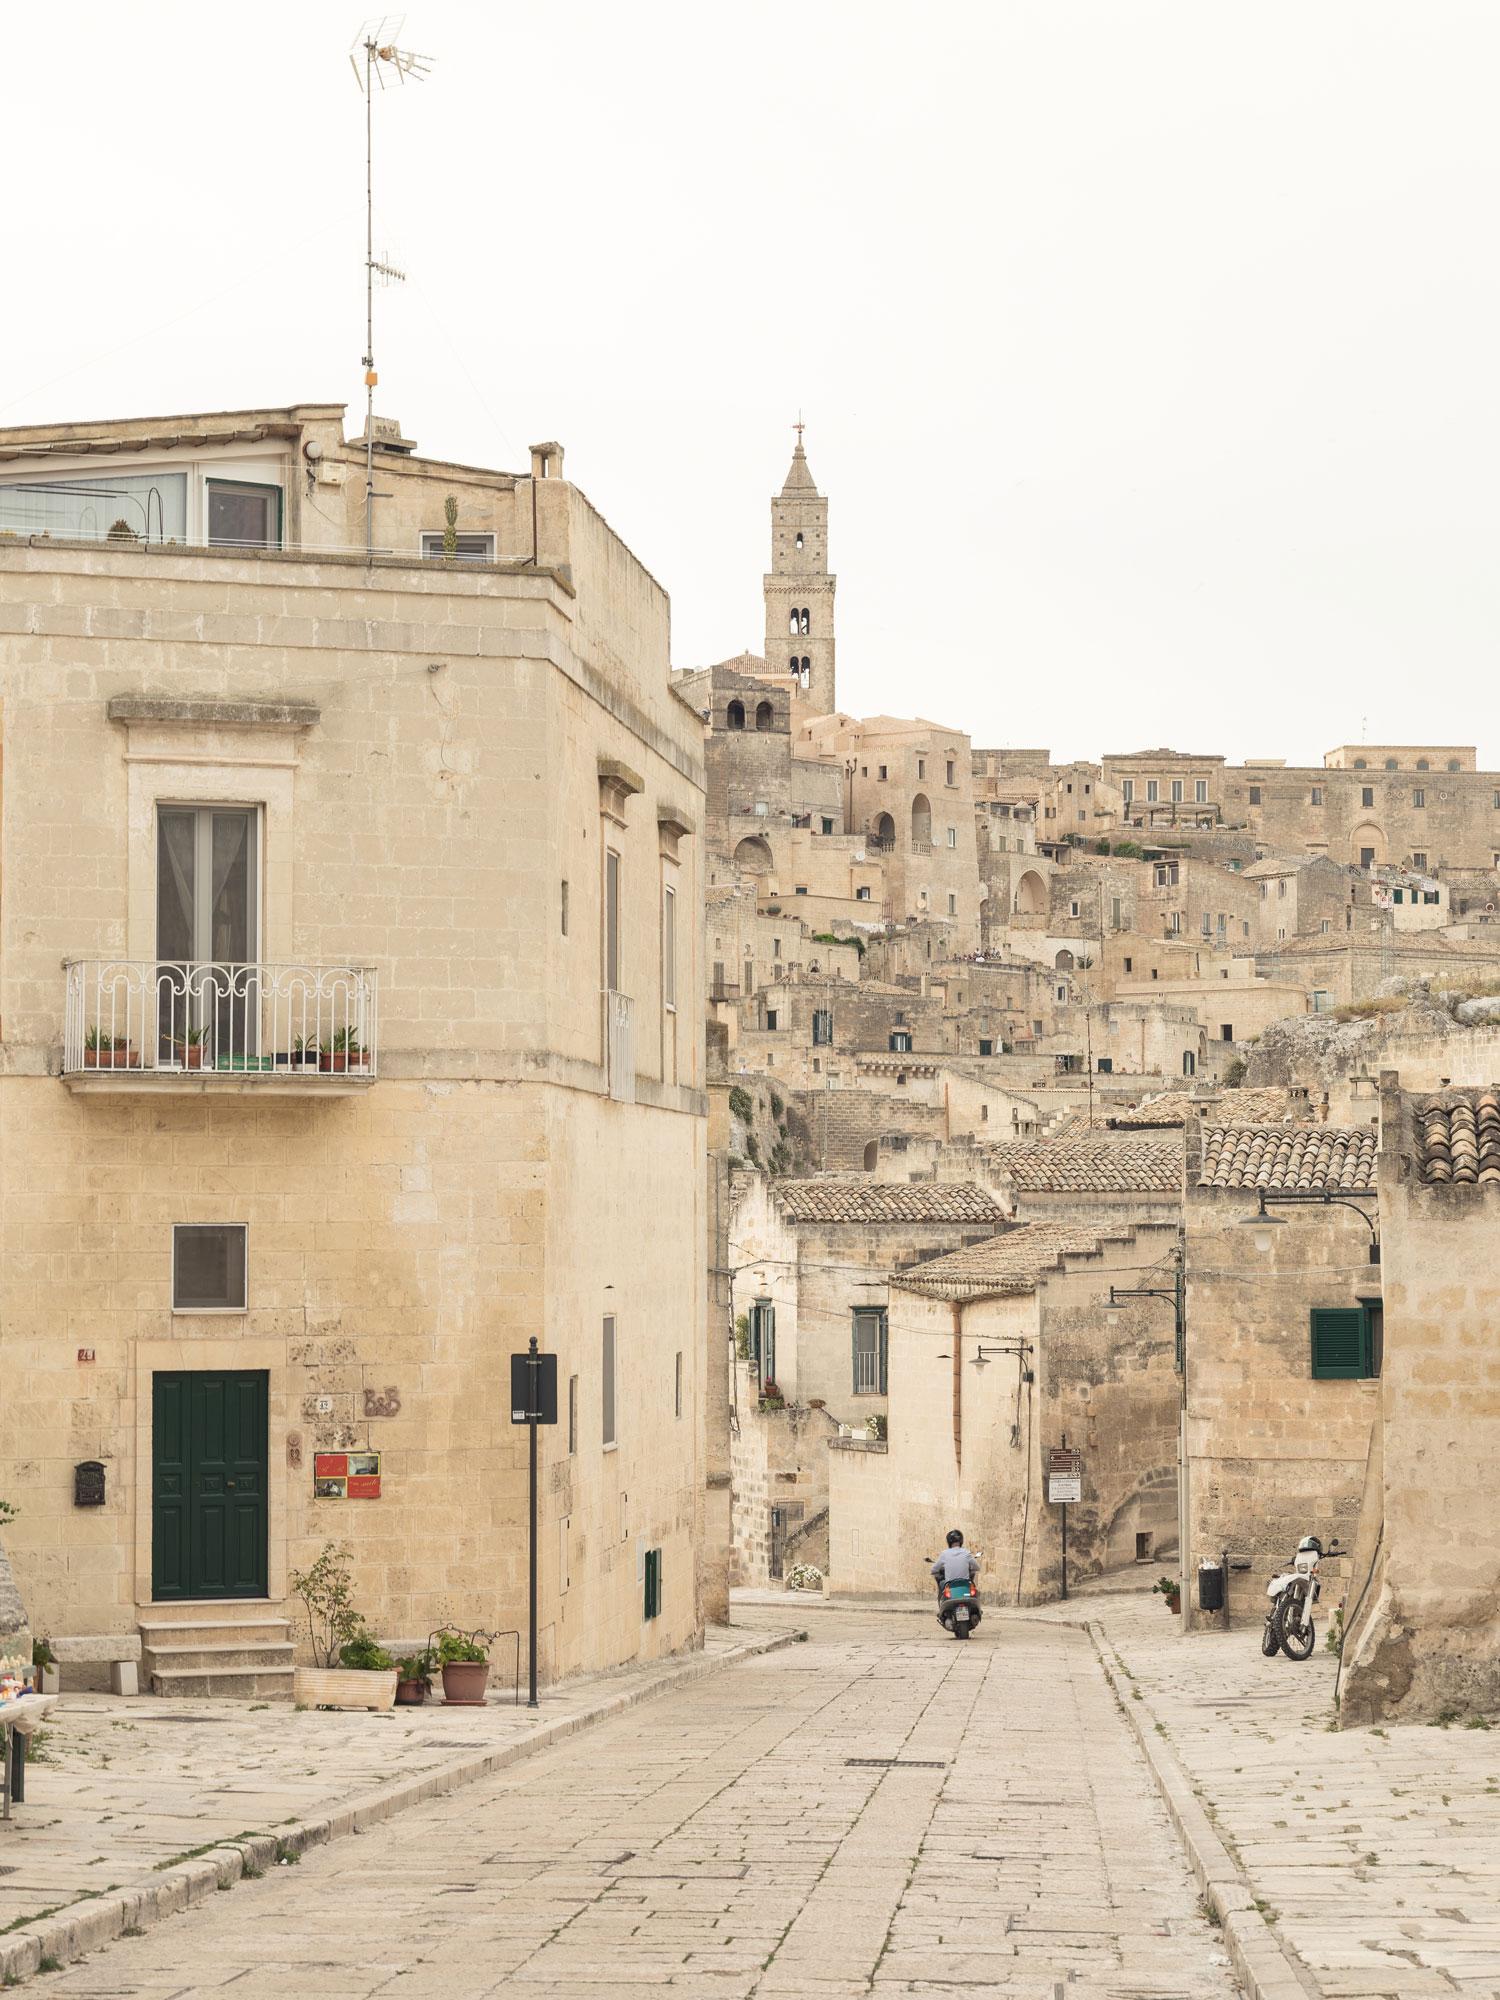 Enoteca-dai-Tosi-Wine-Bar-in-Matera-Italy-by-Architecten-De-Vylder-Vinck-Taillieu-cafeveyafe (6)